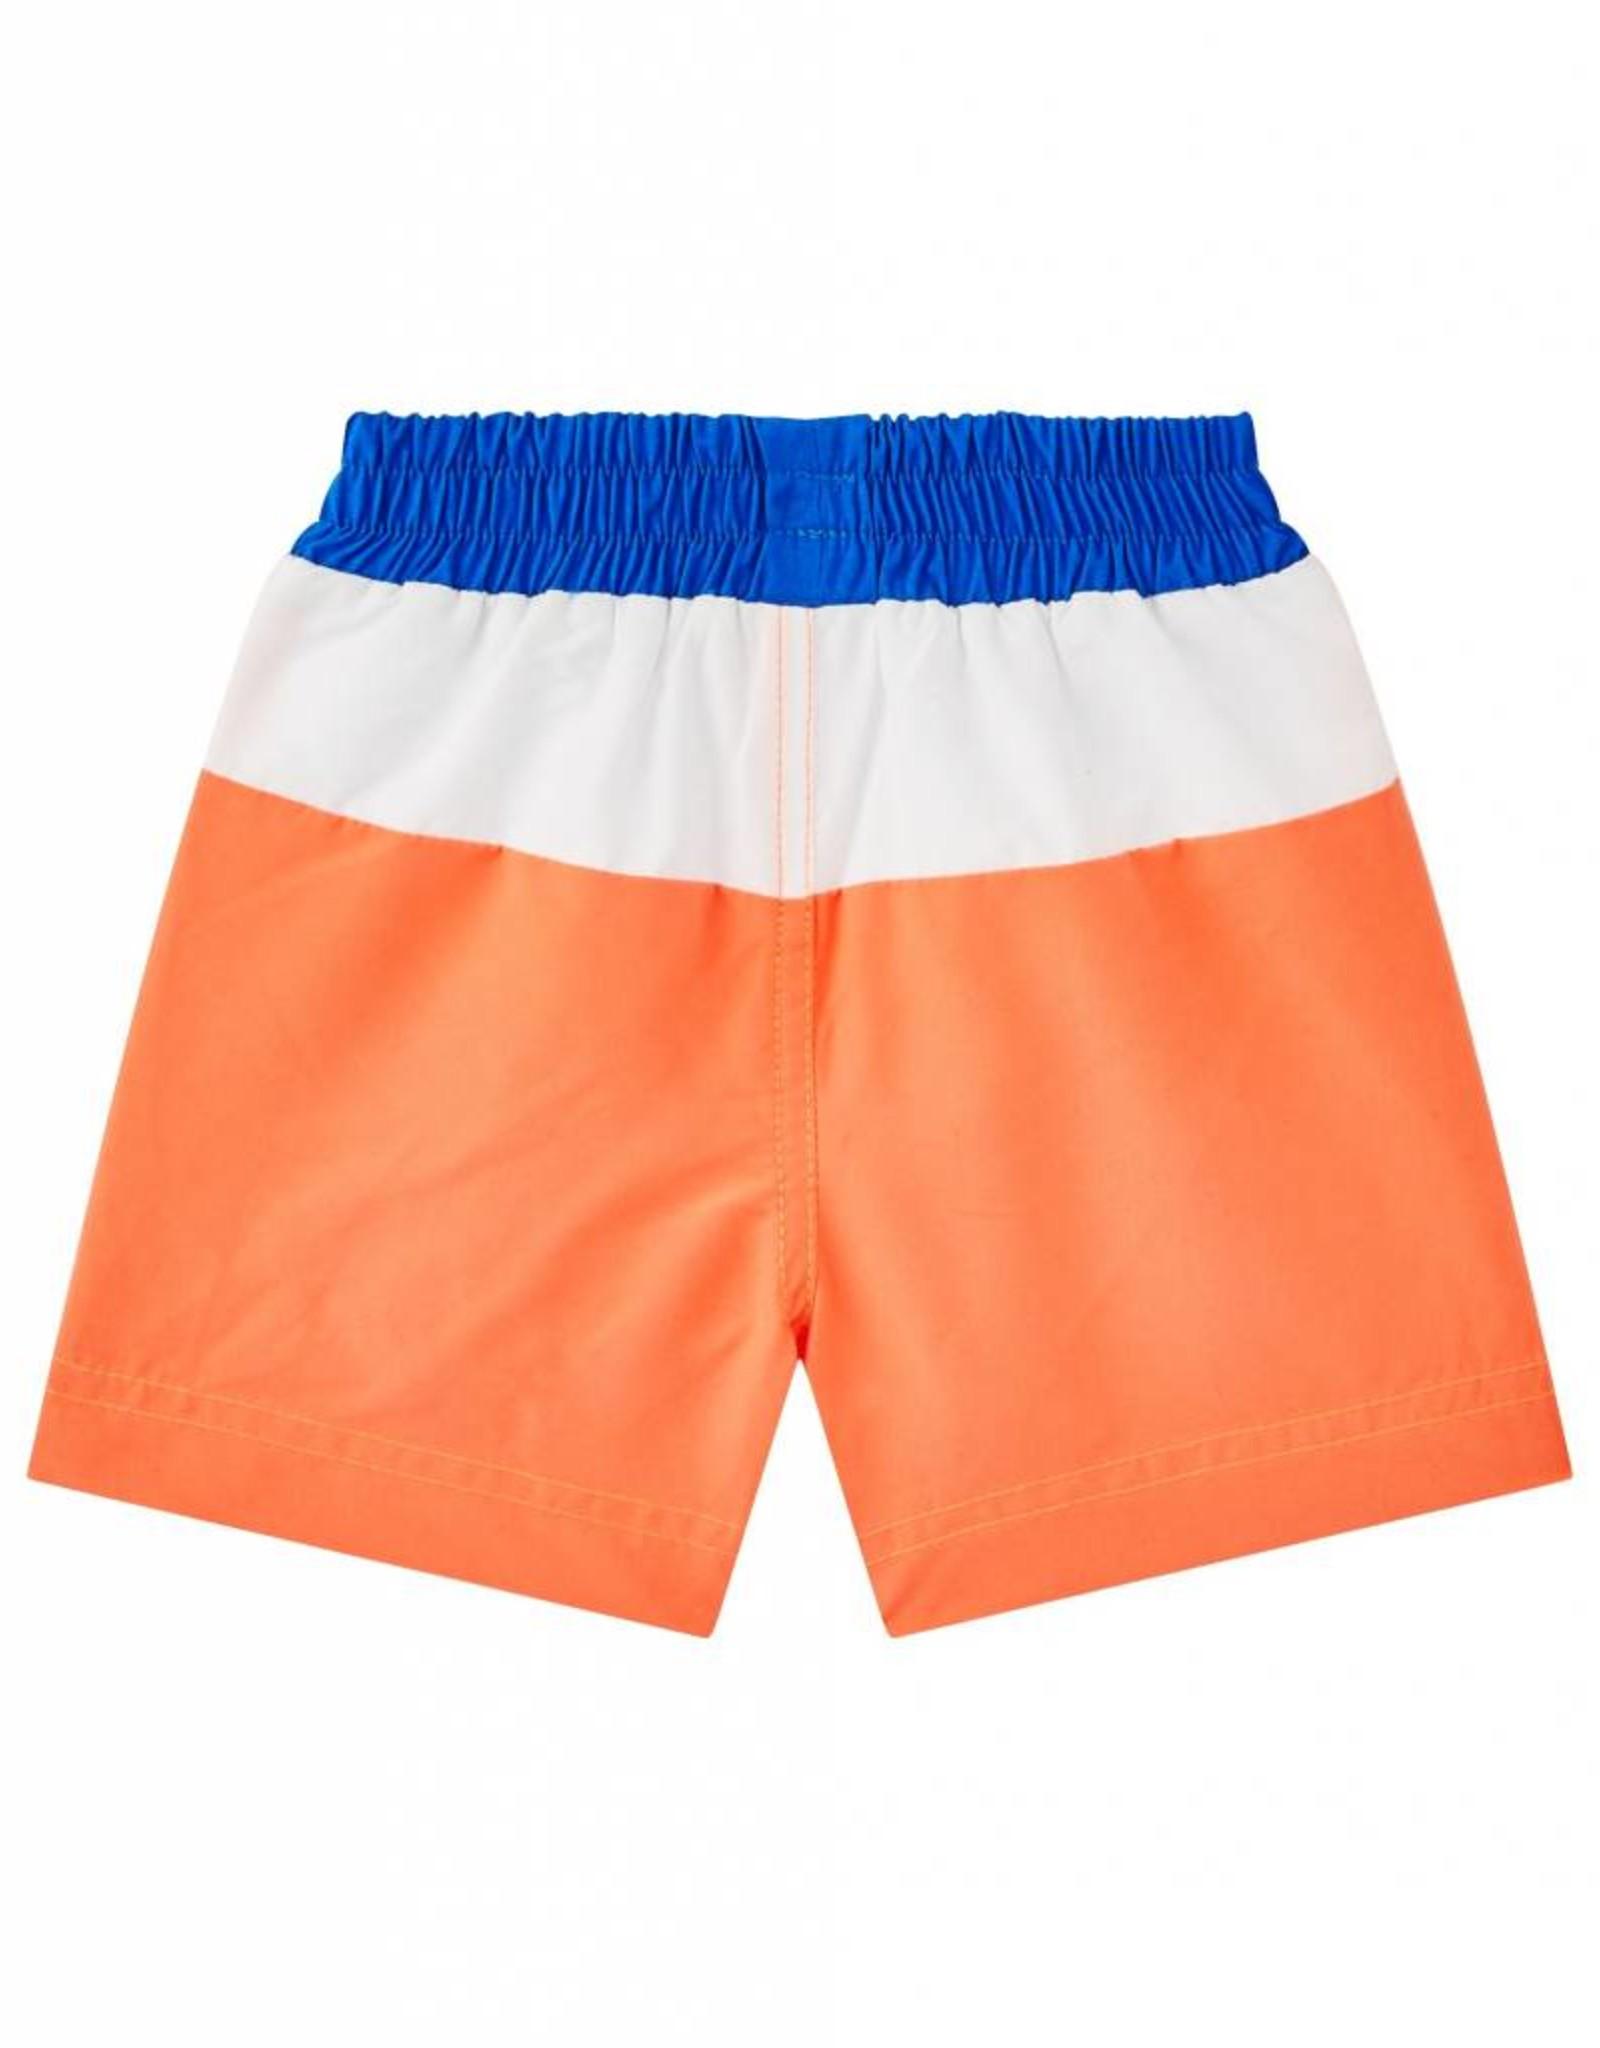 Petit Bateau Boys Marley Swim Short